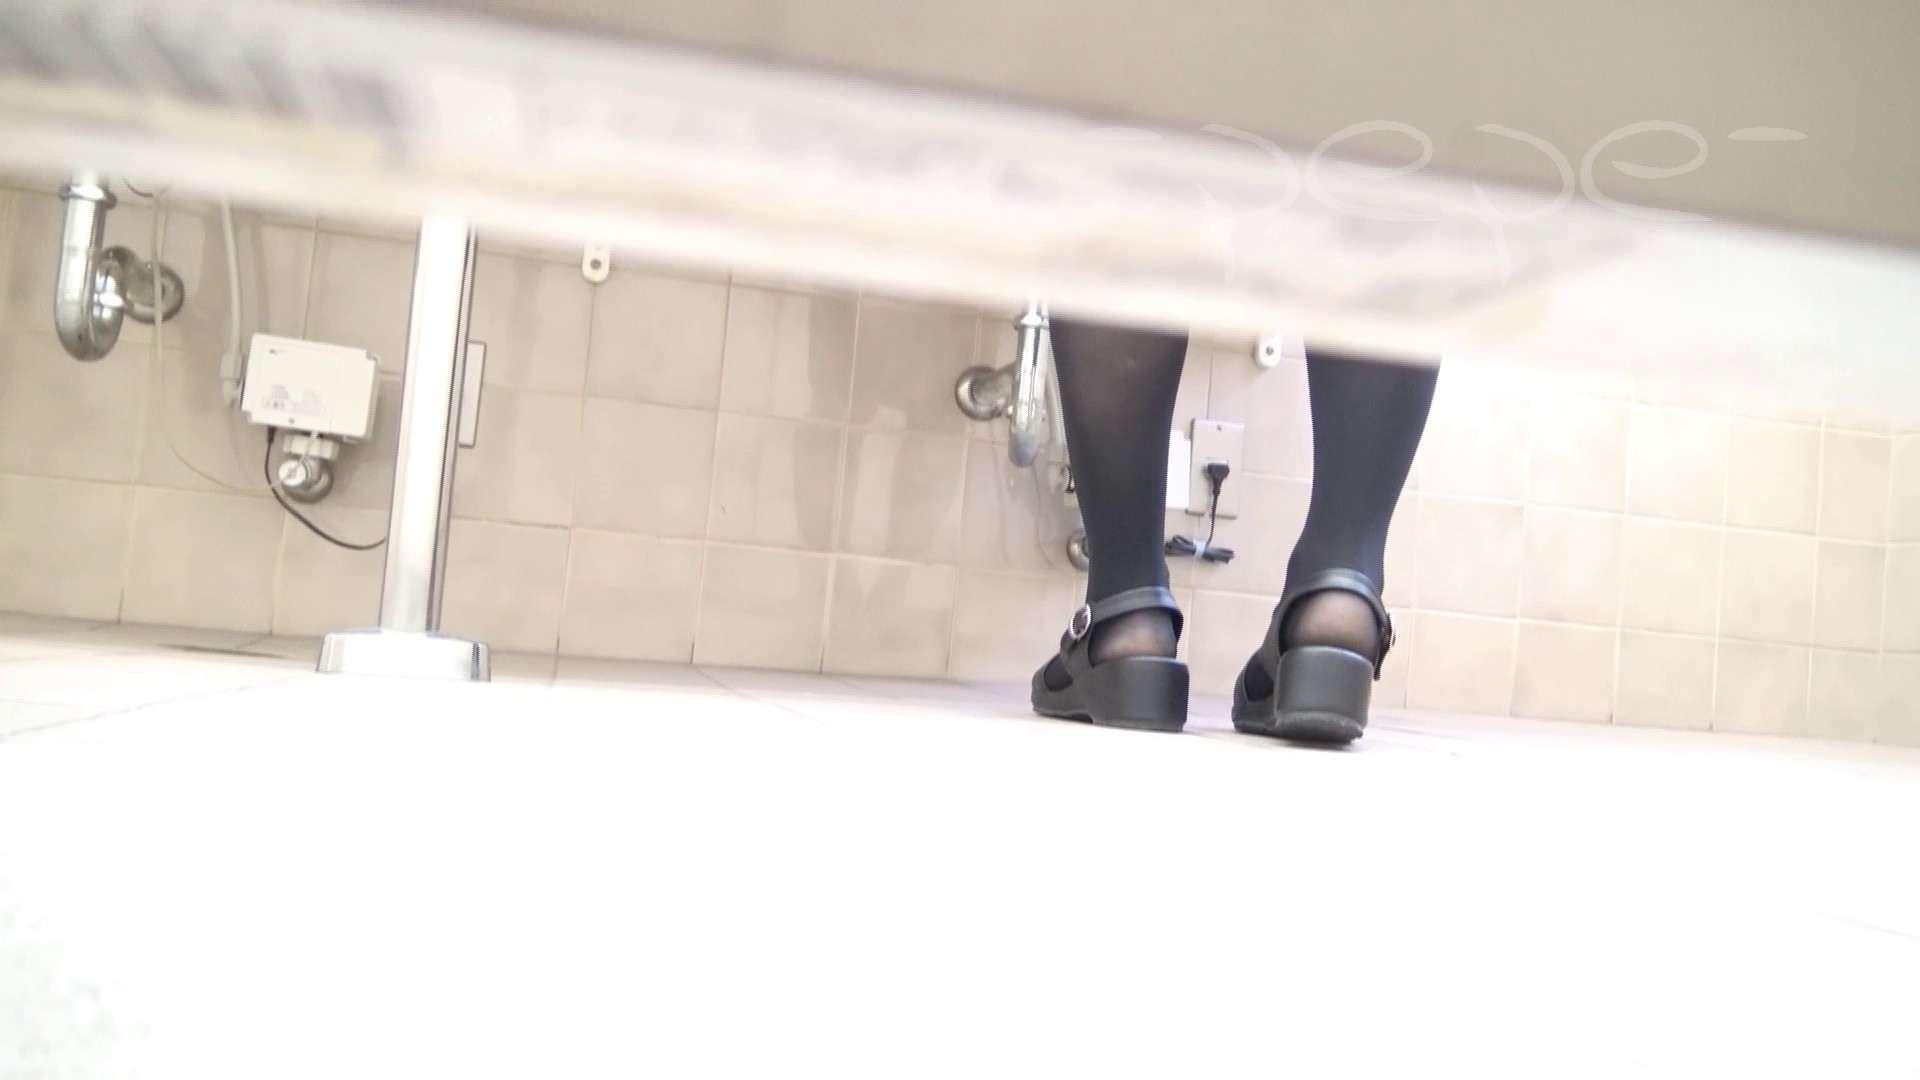 至高洗面所盗撮 01 至高の院内下方撮り 盗撮で悶絶 AV無料 65画像 23